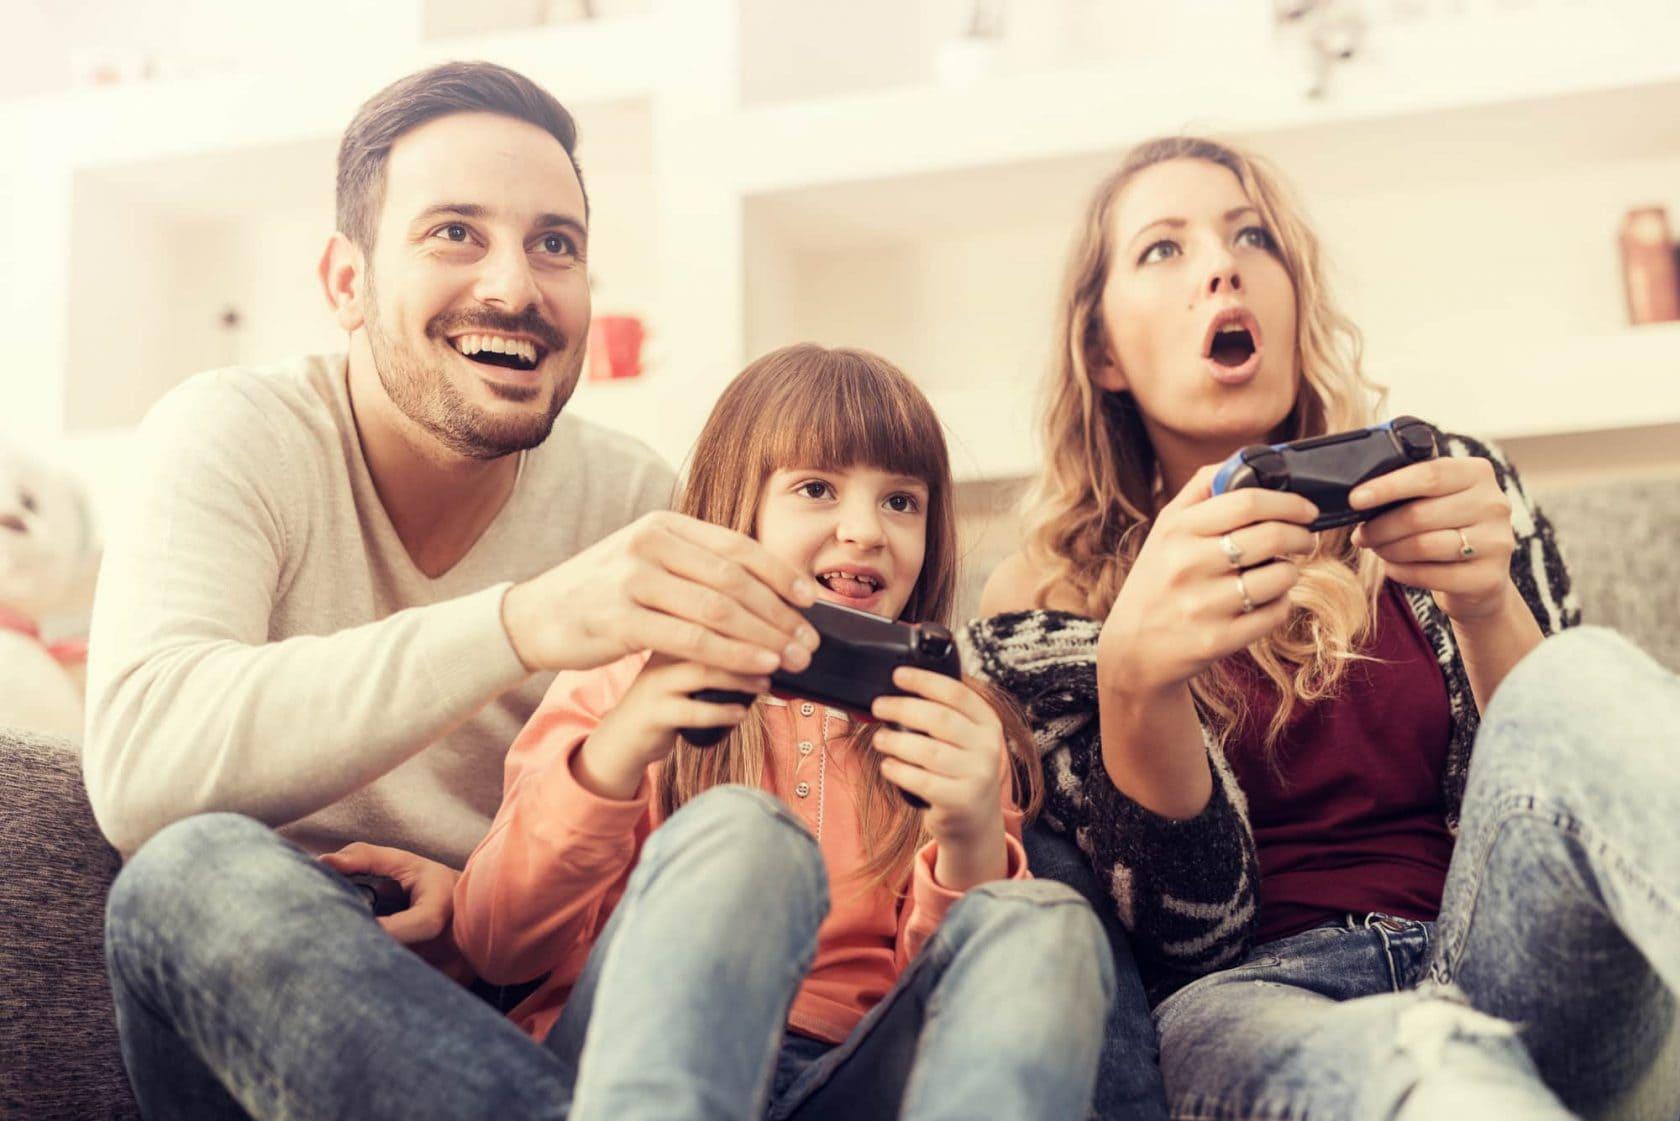 videojuegos-en-familia-educacion-digital